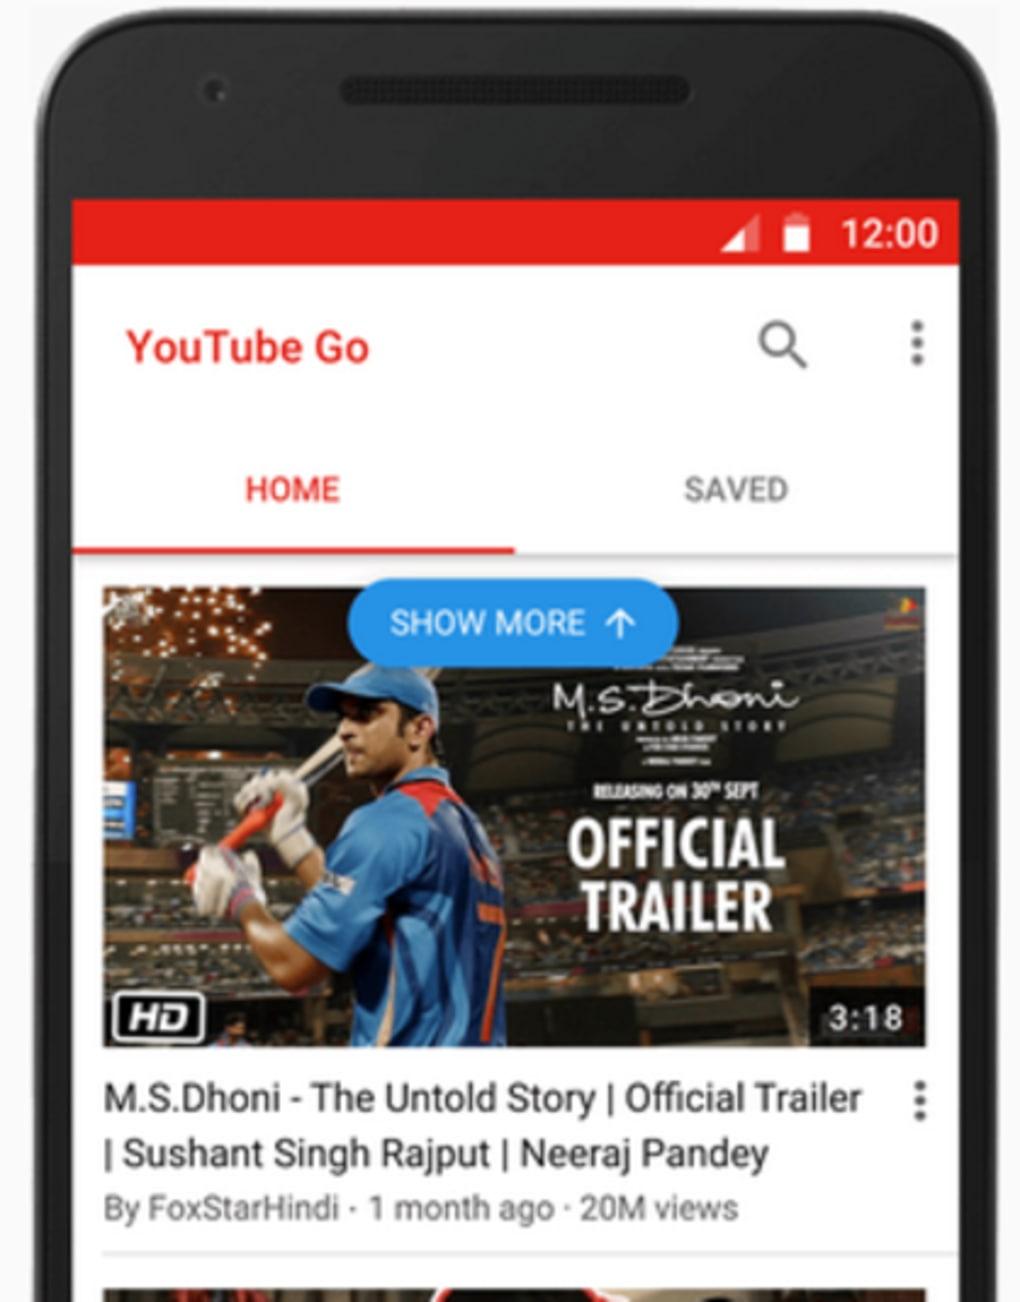 application telecharger musique youtube iphone sans internet